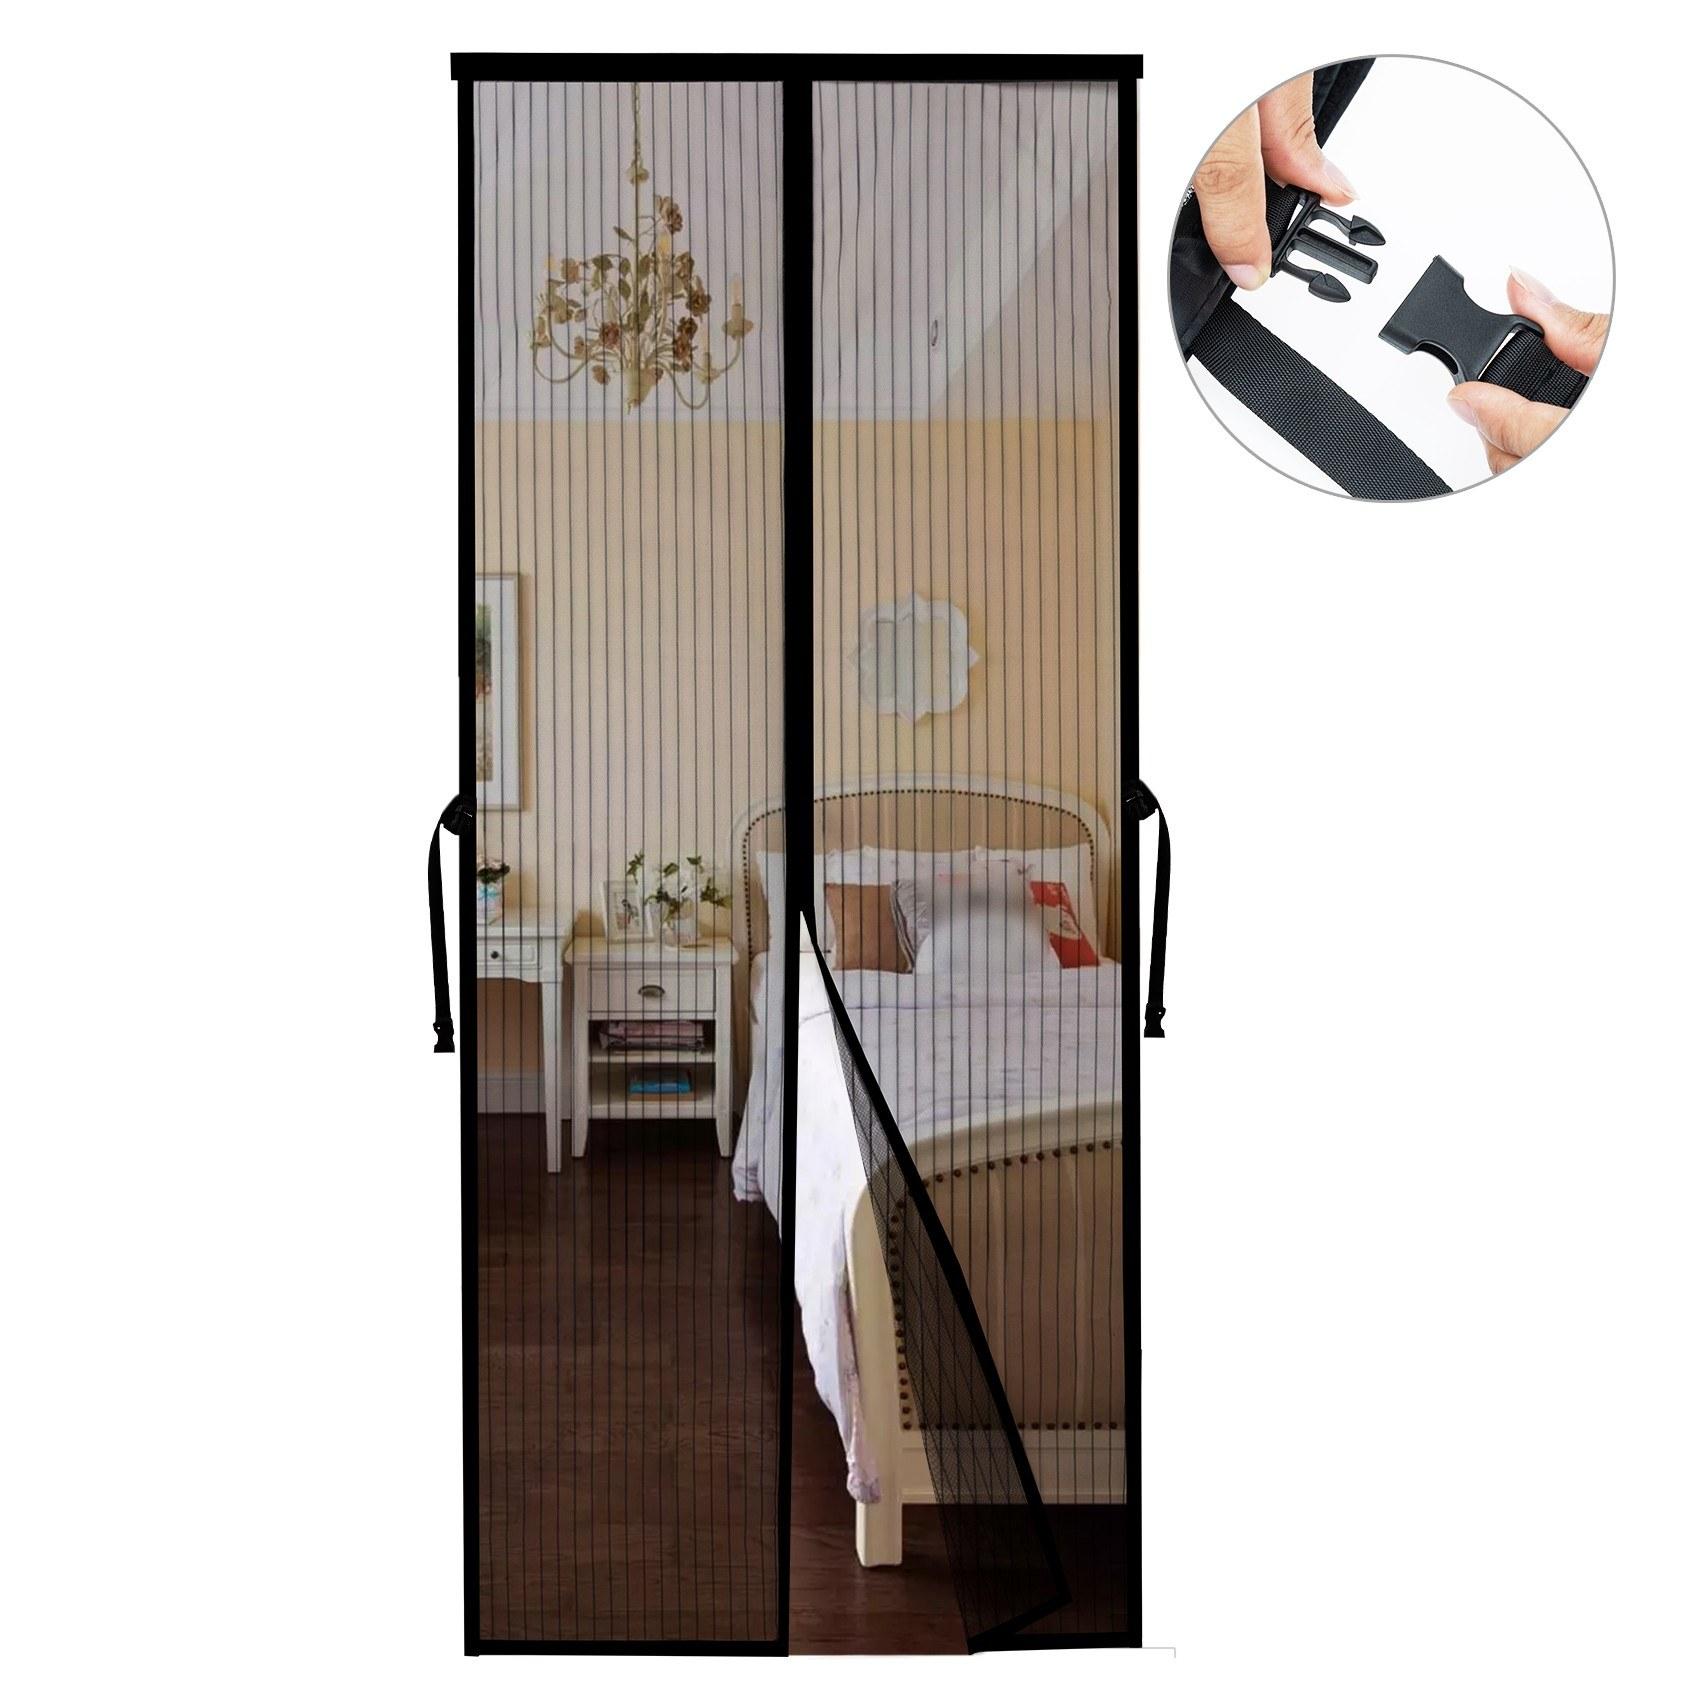 Tomtop - 39% OFF Magnetics Screen Door with Full Frame Magic-Tape, $16.99 (Inclusive of VAT)